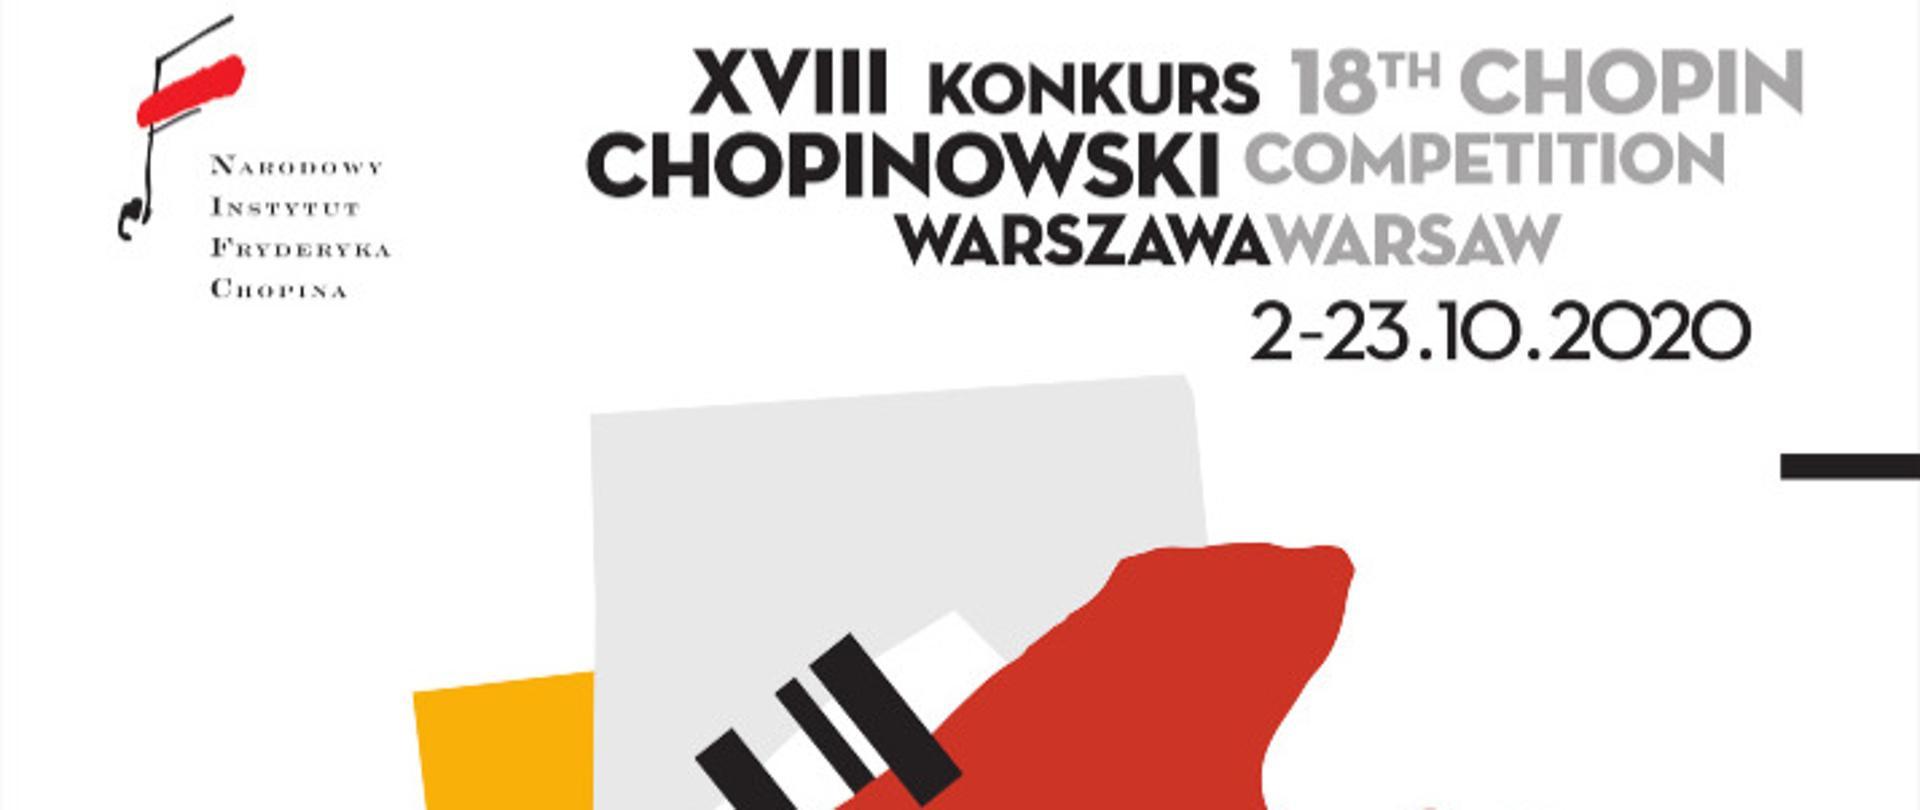 konkurs chopinowski 2020.jpg